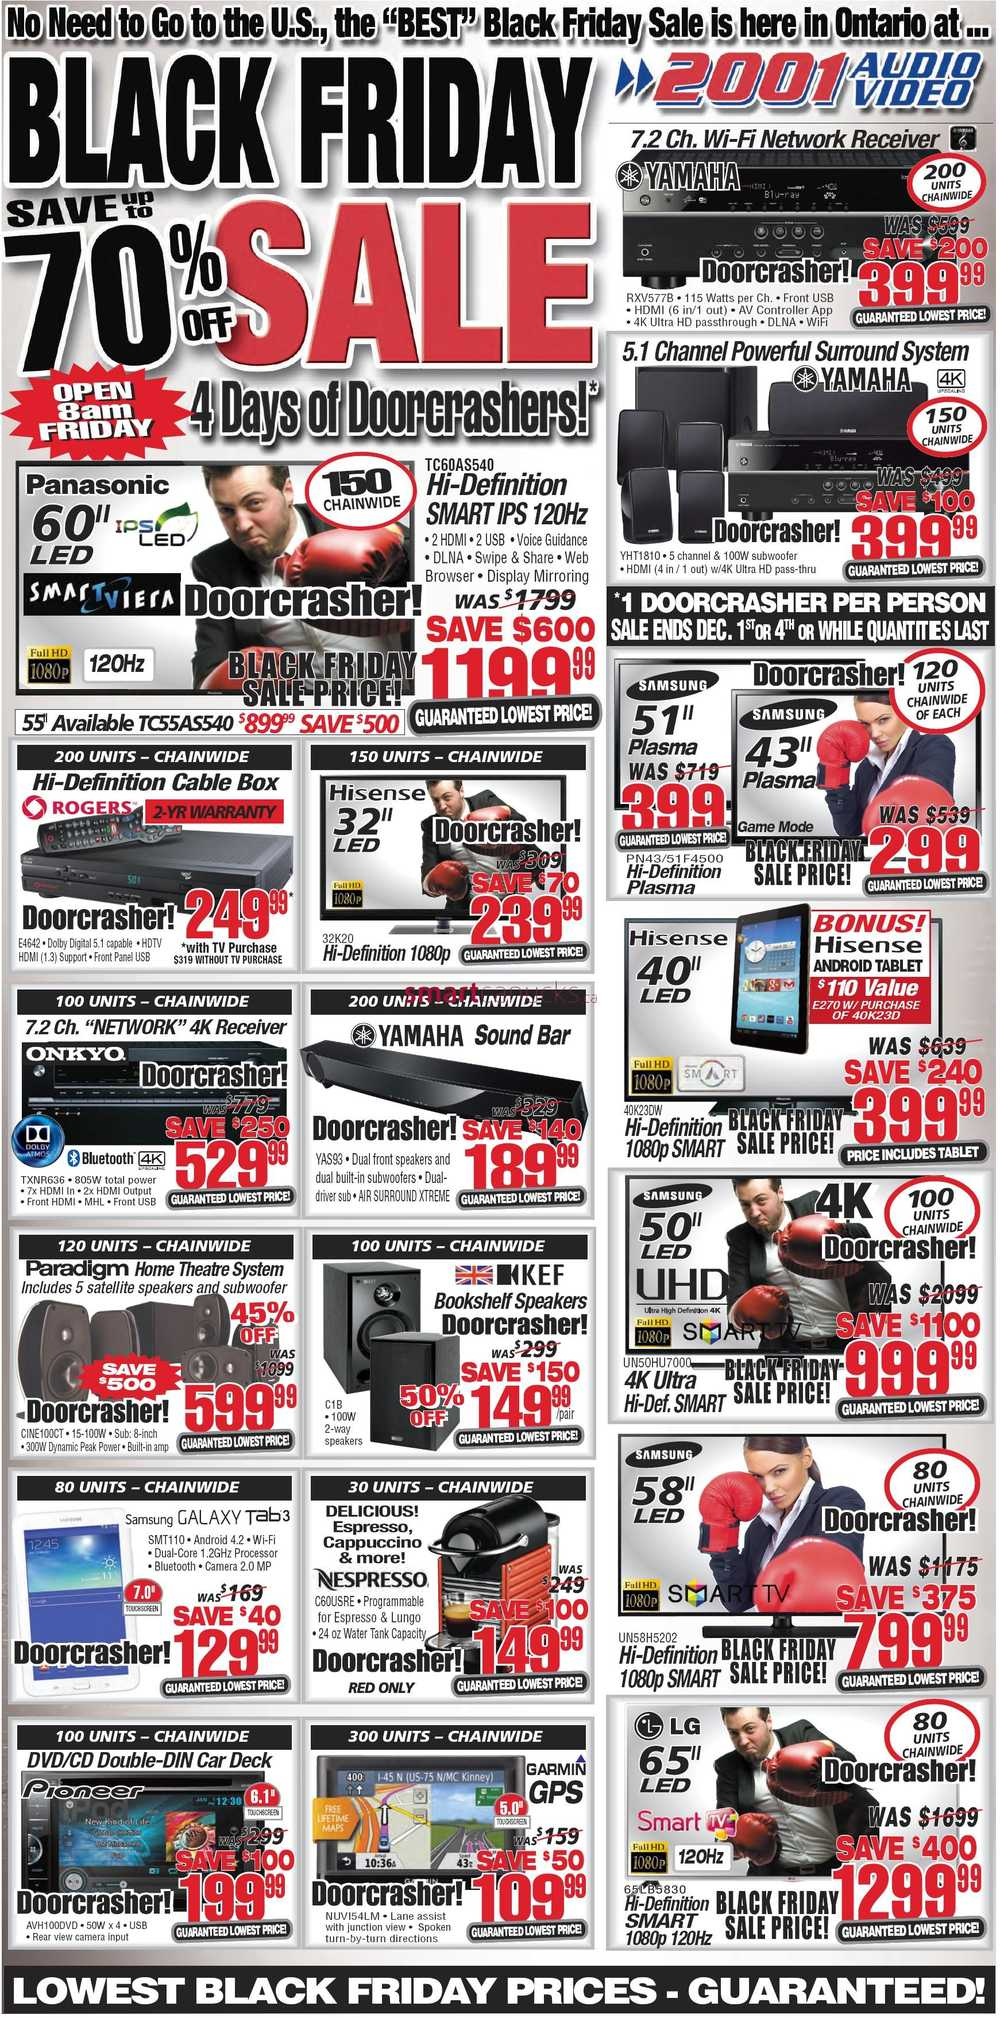 2001 Audio Video Black Friday 2014 Flyer Sales Deals